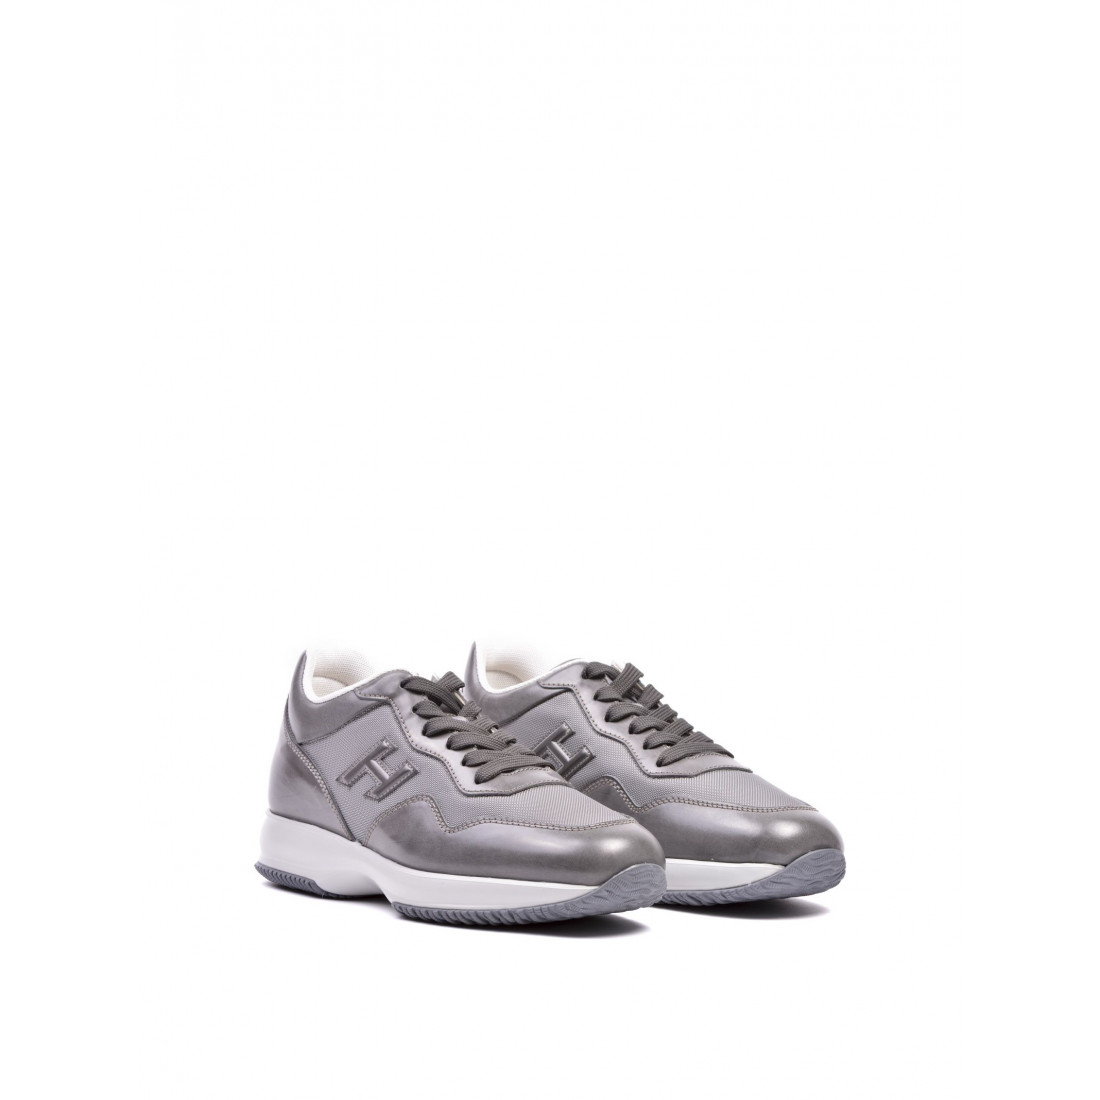 sneakers uomo hogan hxm00n0u0405zf4633 395